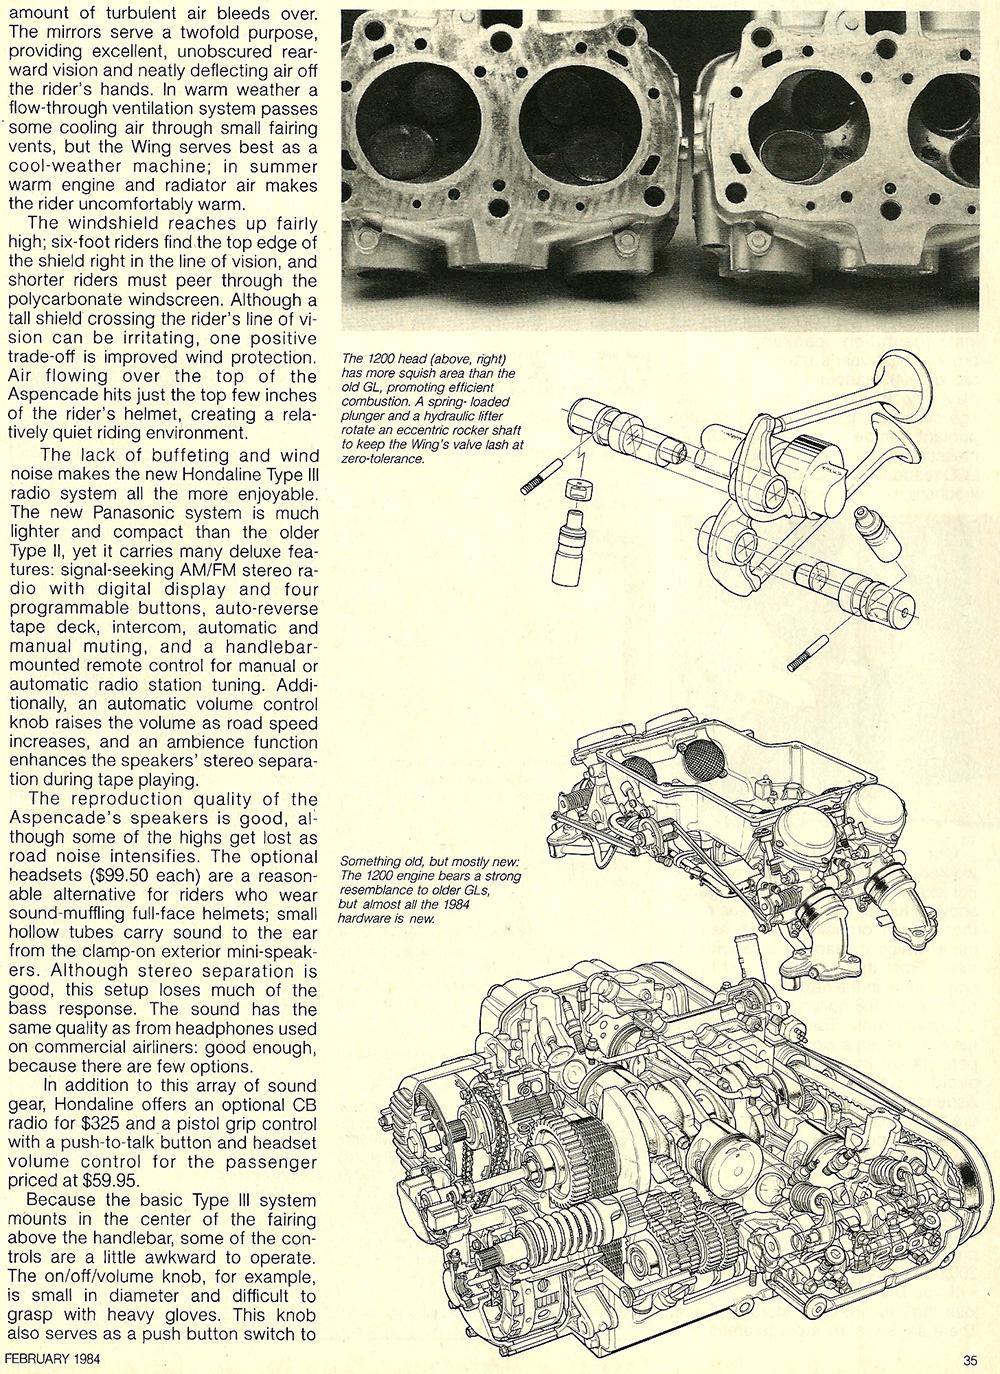 1984 Honda GL1200A Gold Wing Aspencade road test 8.jpg